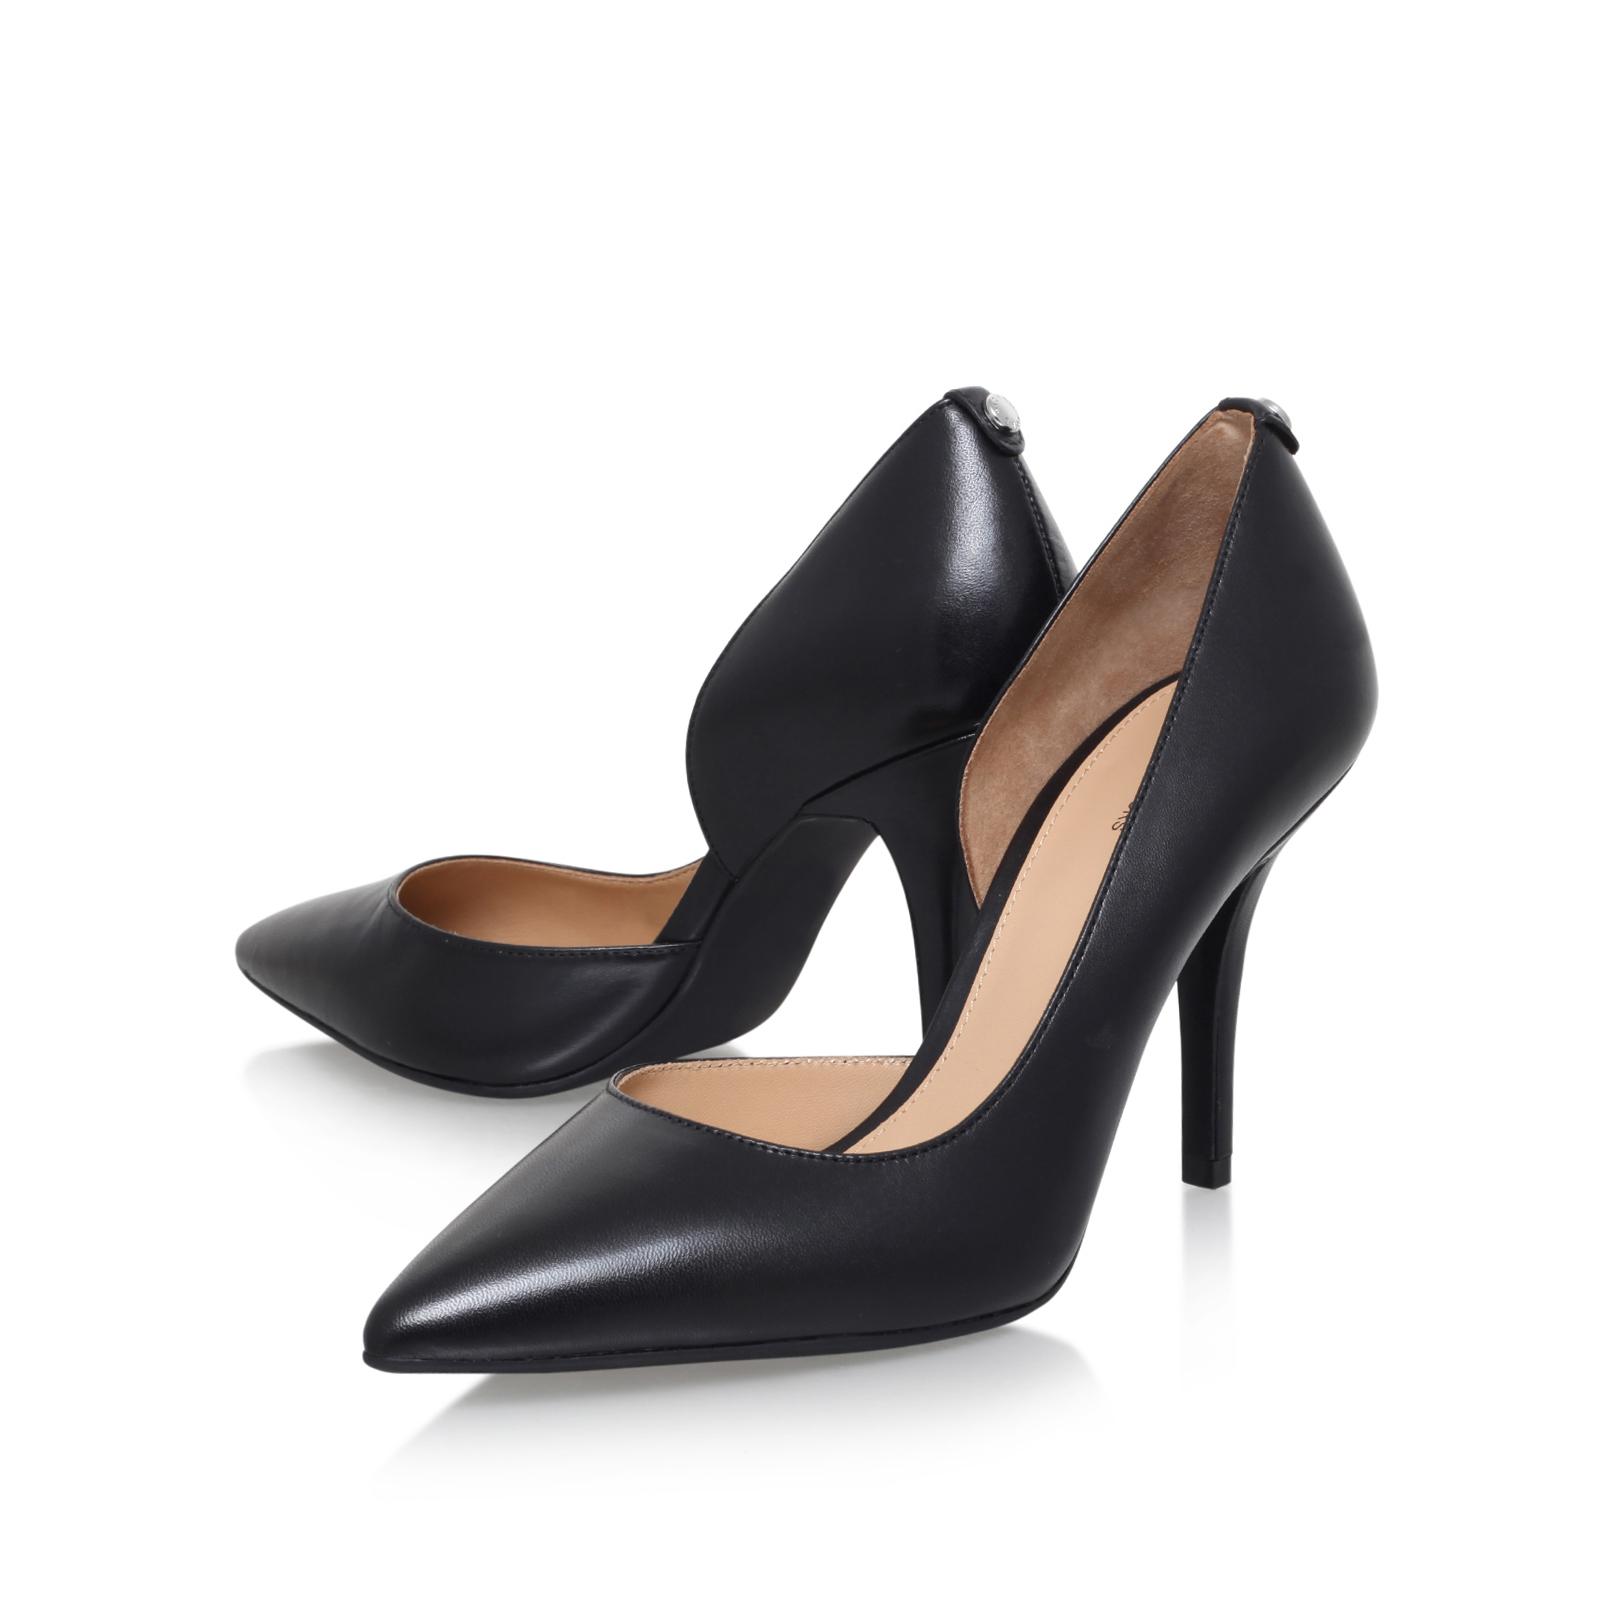 6281b281d9fc ... NATHALIE FLEX HIGH PUMP Michael Michael Kors Nathalie Black High Heel  Court Shoes by MICHAEL MICHAEL ...